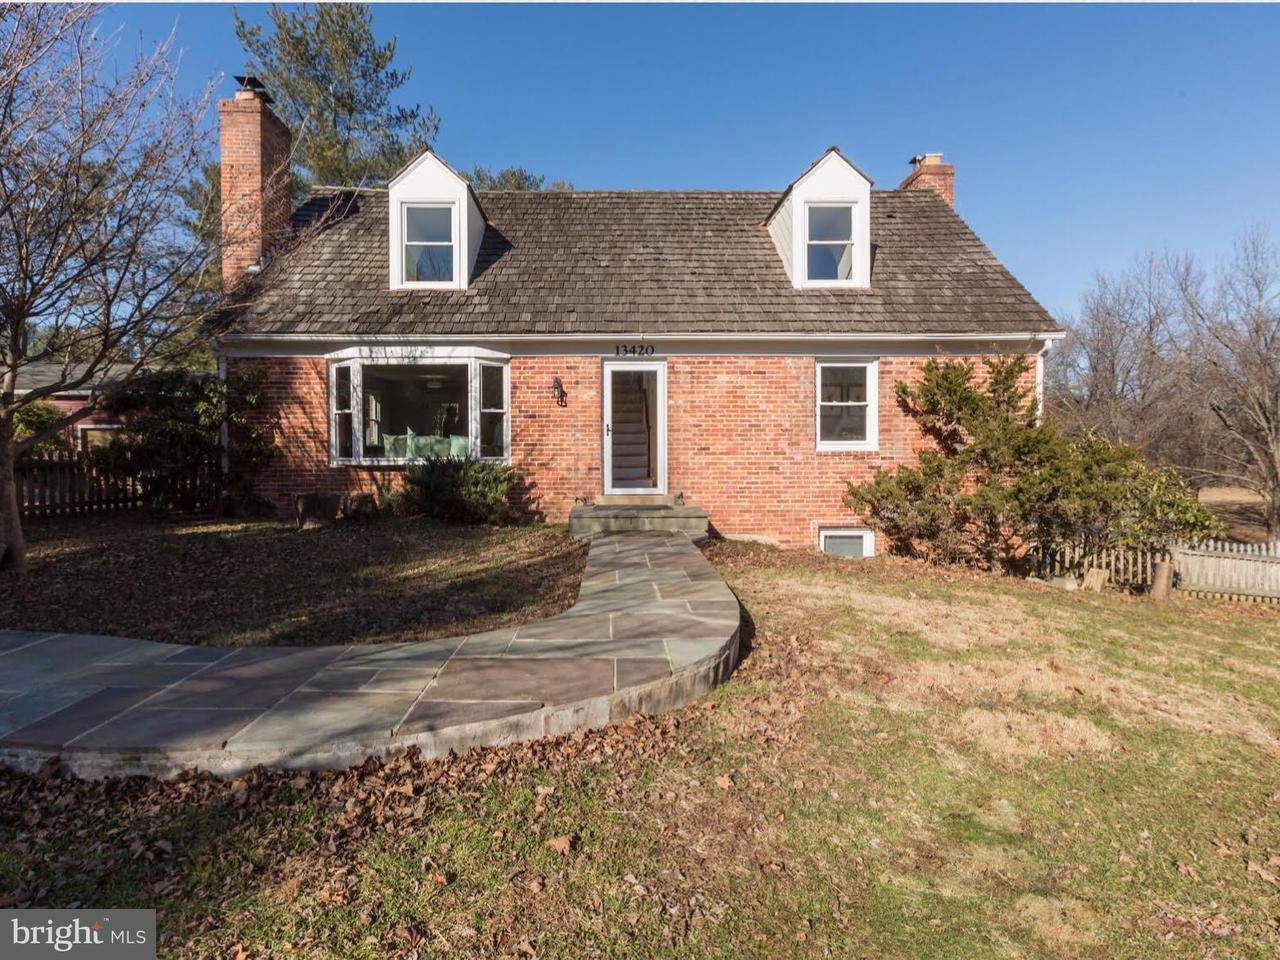 獨棟家庭住宅 為 出售 在 13420 Query Mill Road 13420 Query Mill Road North Potomac, 馬里蘭州 20878 美國